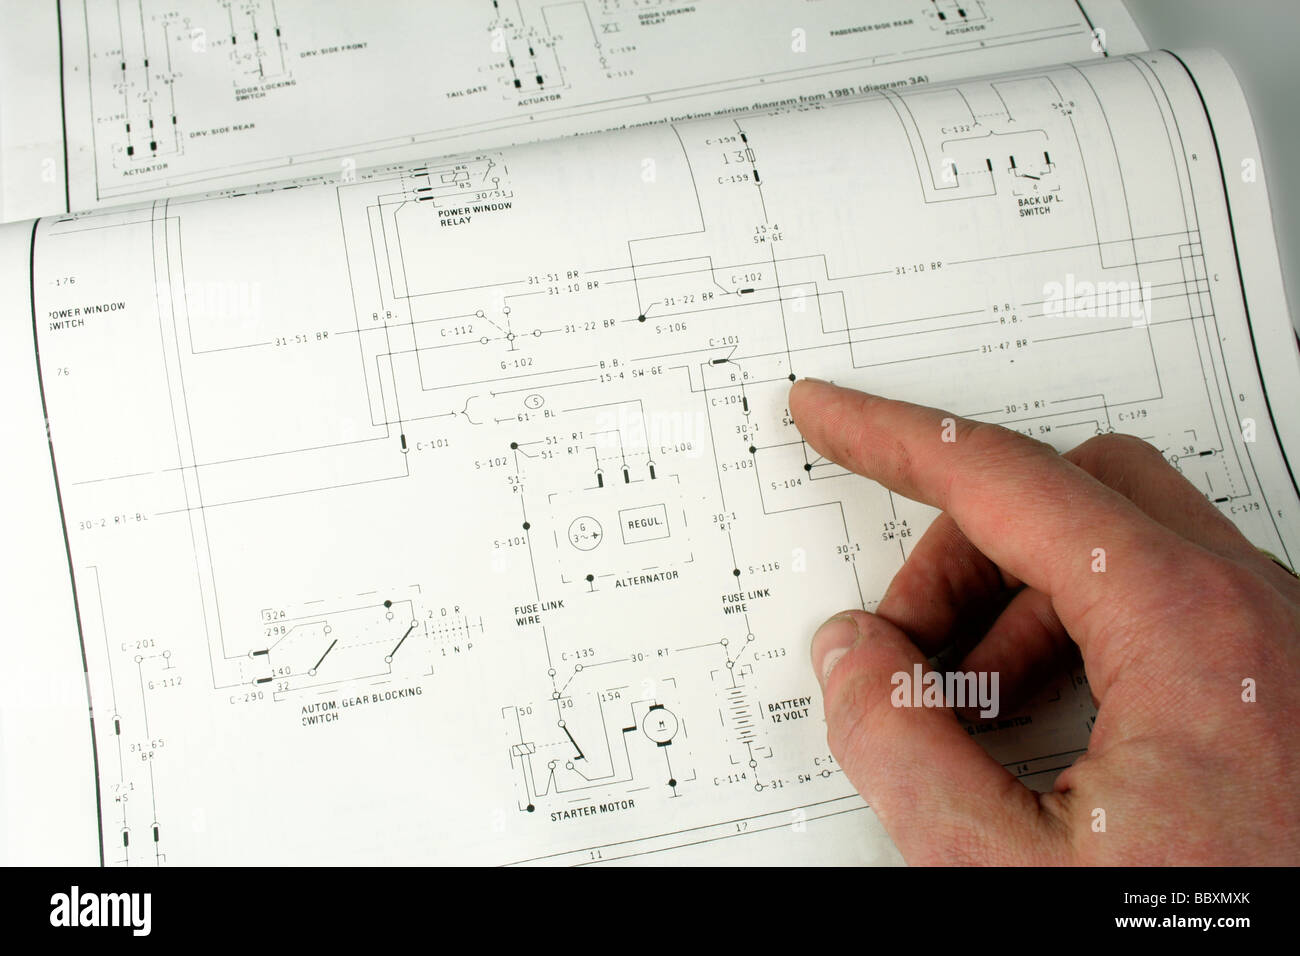 man referring to electrical wiring diagram - Stock Image